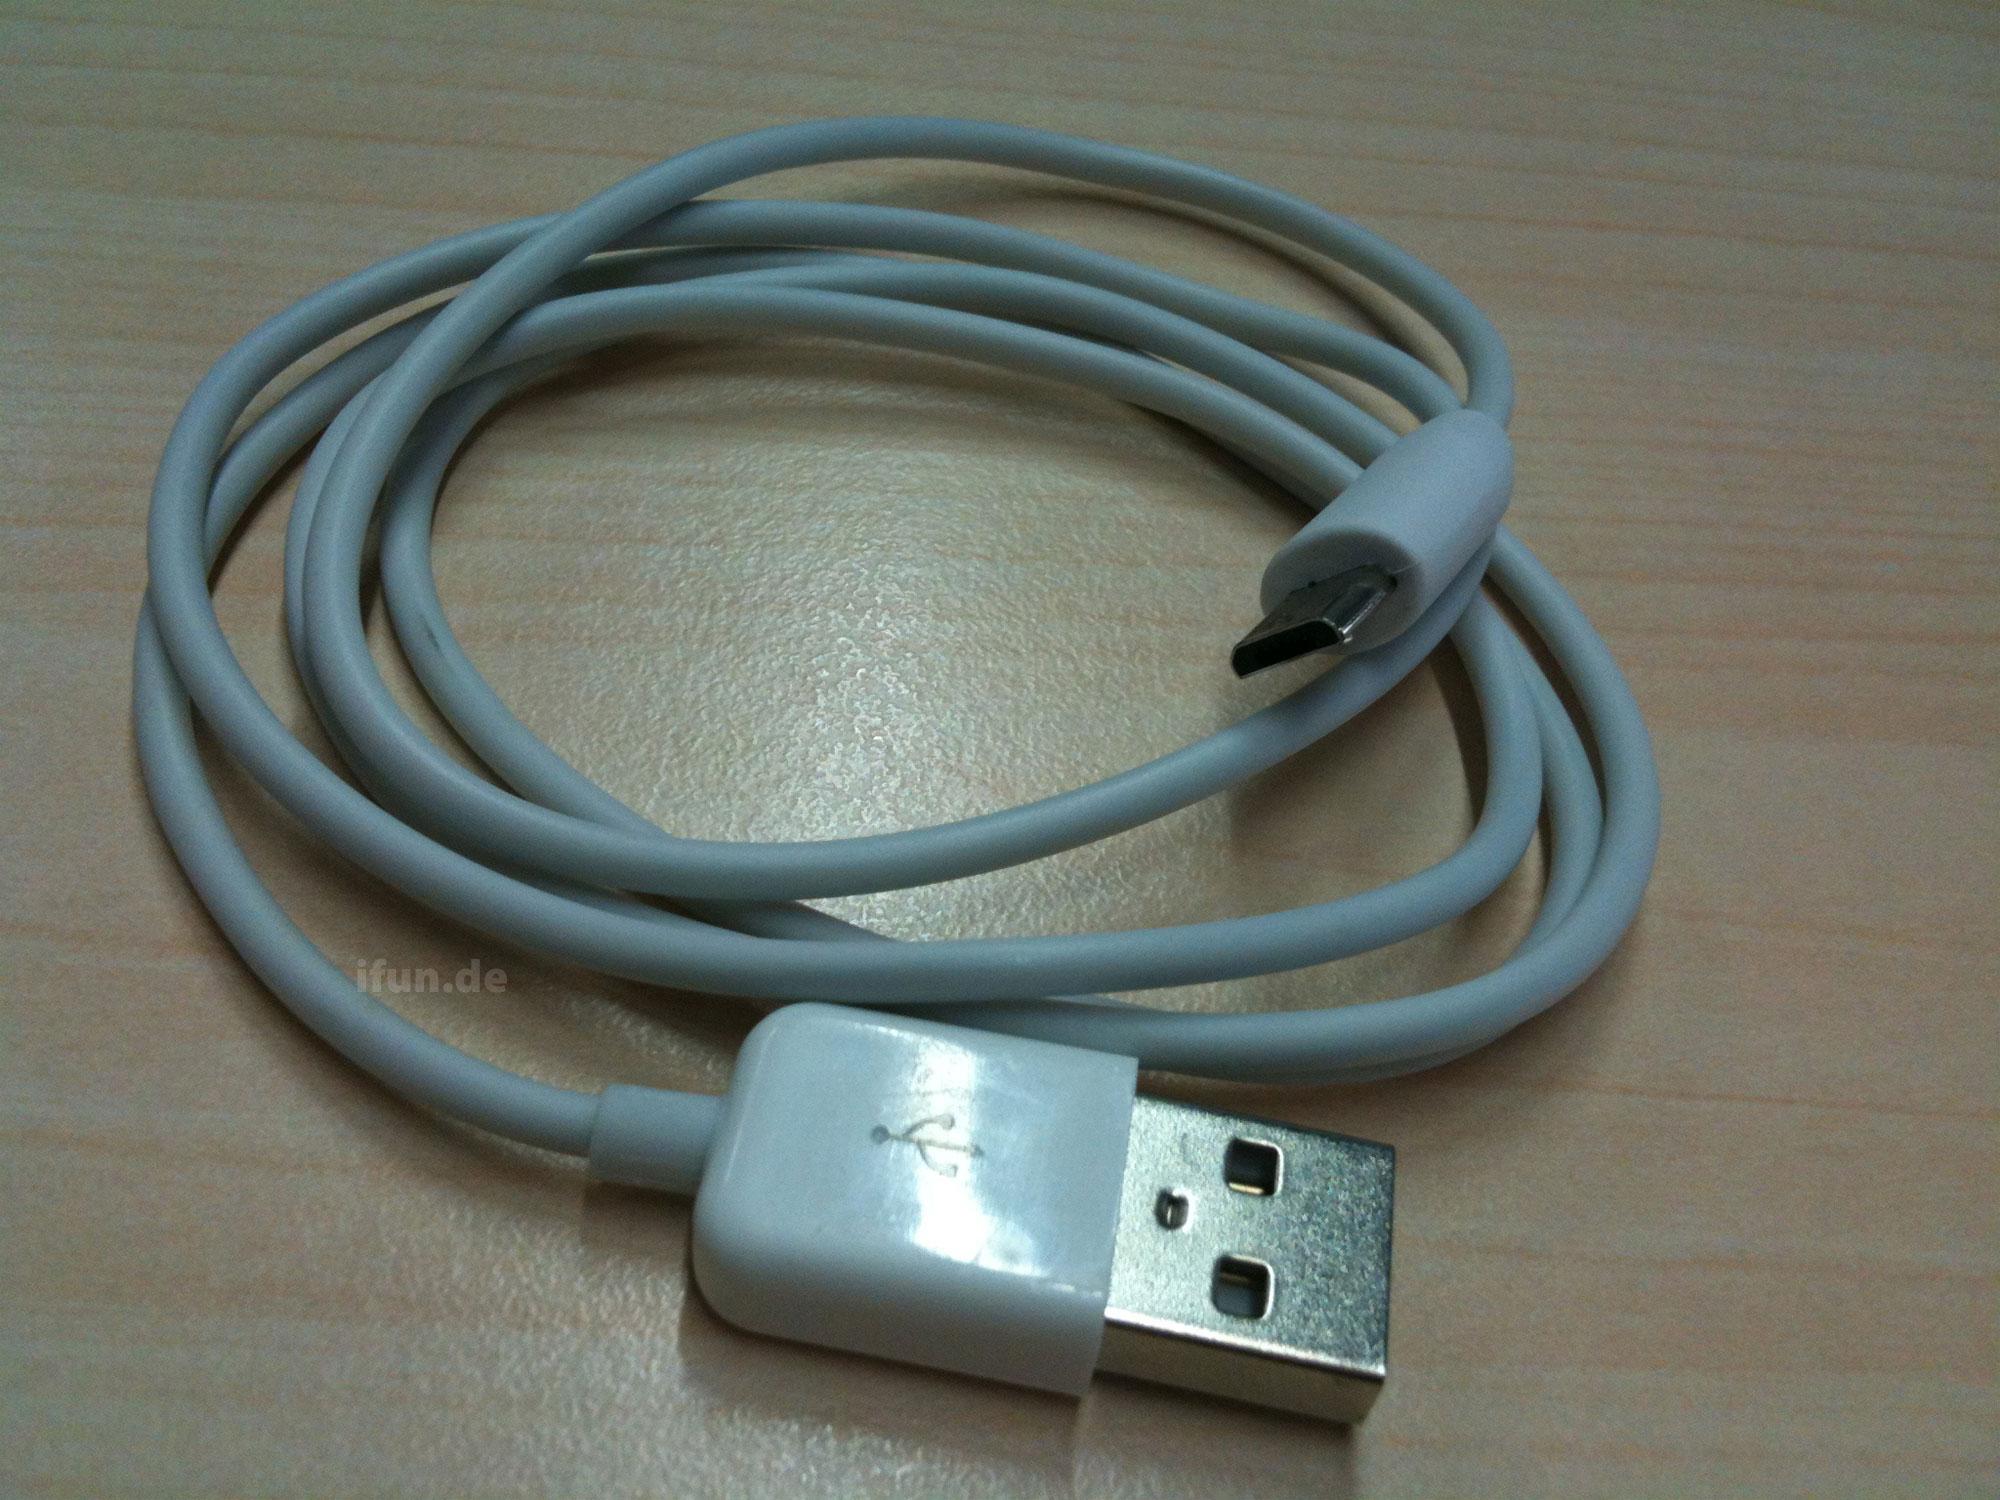 erste vorserien adapter micro usb kabel mit apple branding iphone. Black Bedroom Furniture Sets. Home Design Ideas